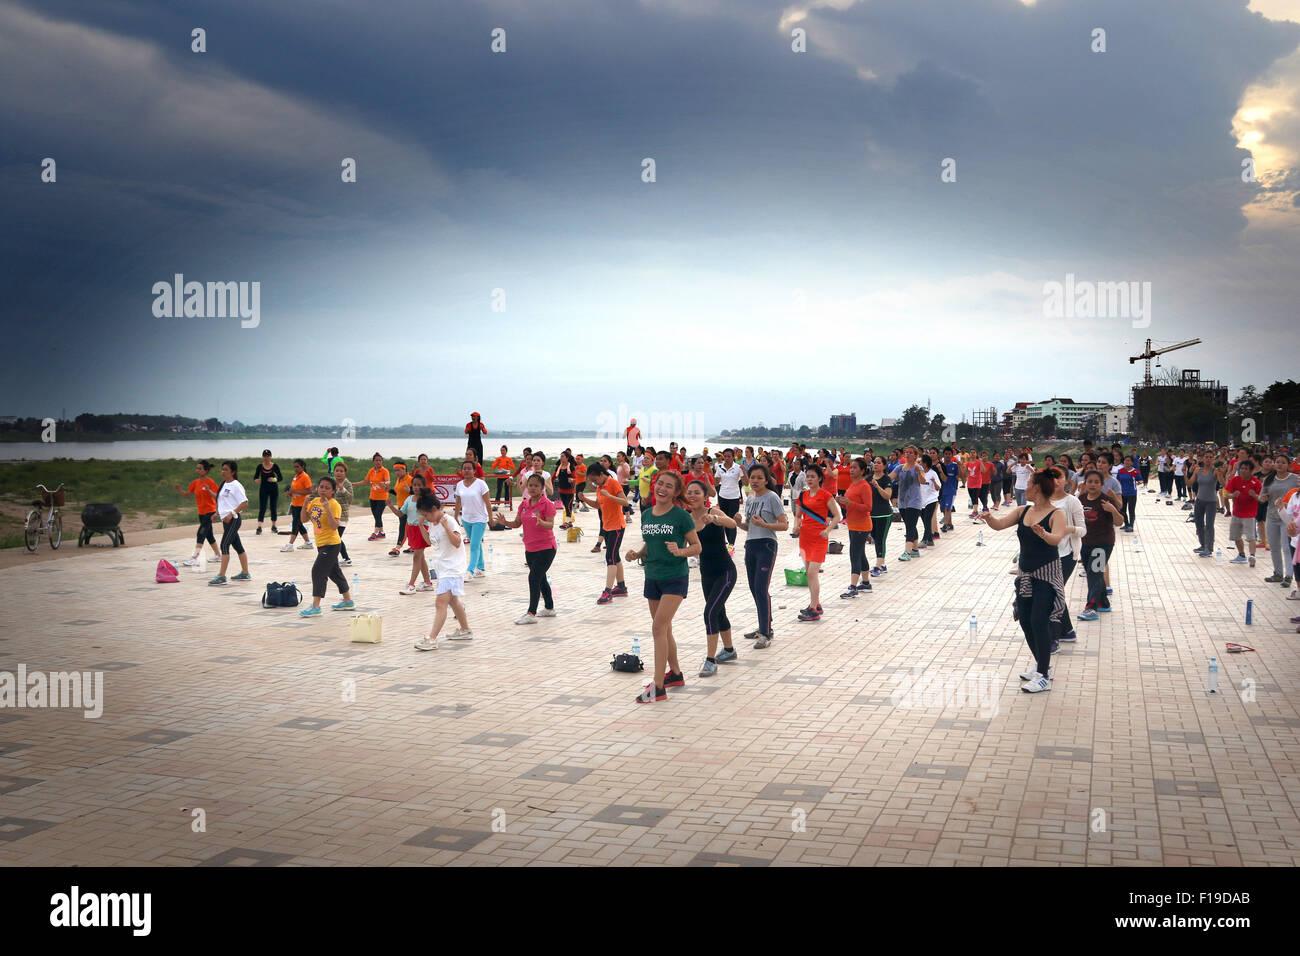 Aerobics exercise keep fit on banks of Mekong River - Stock Image